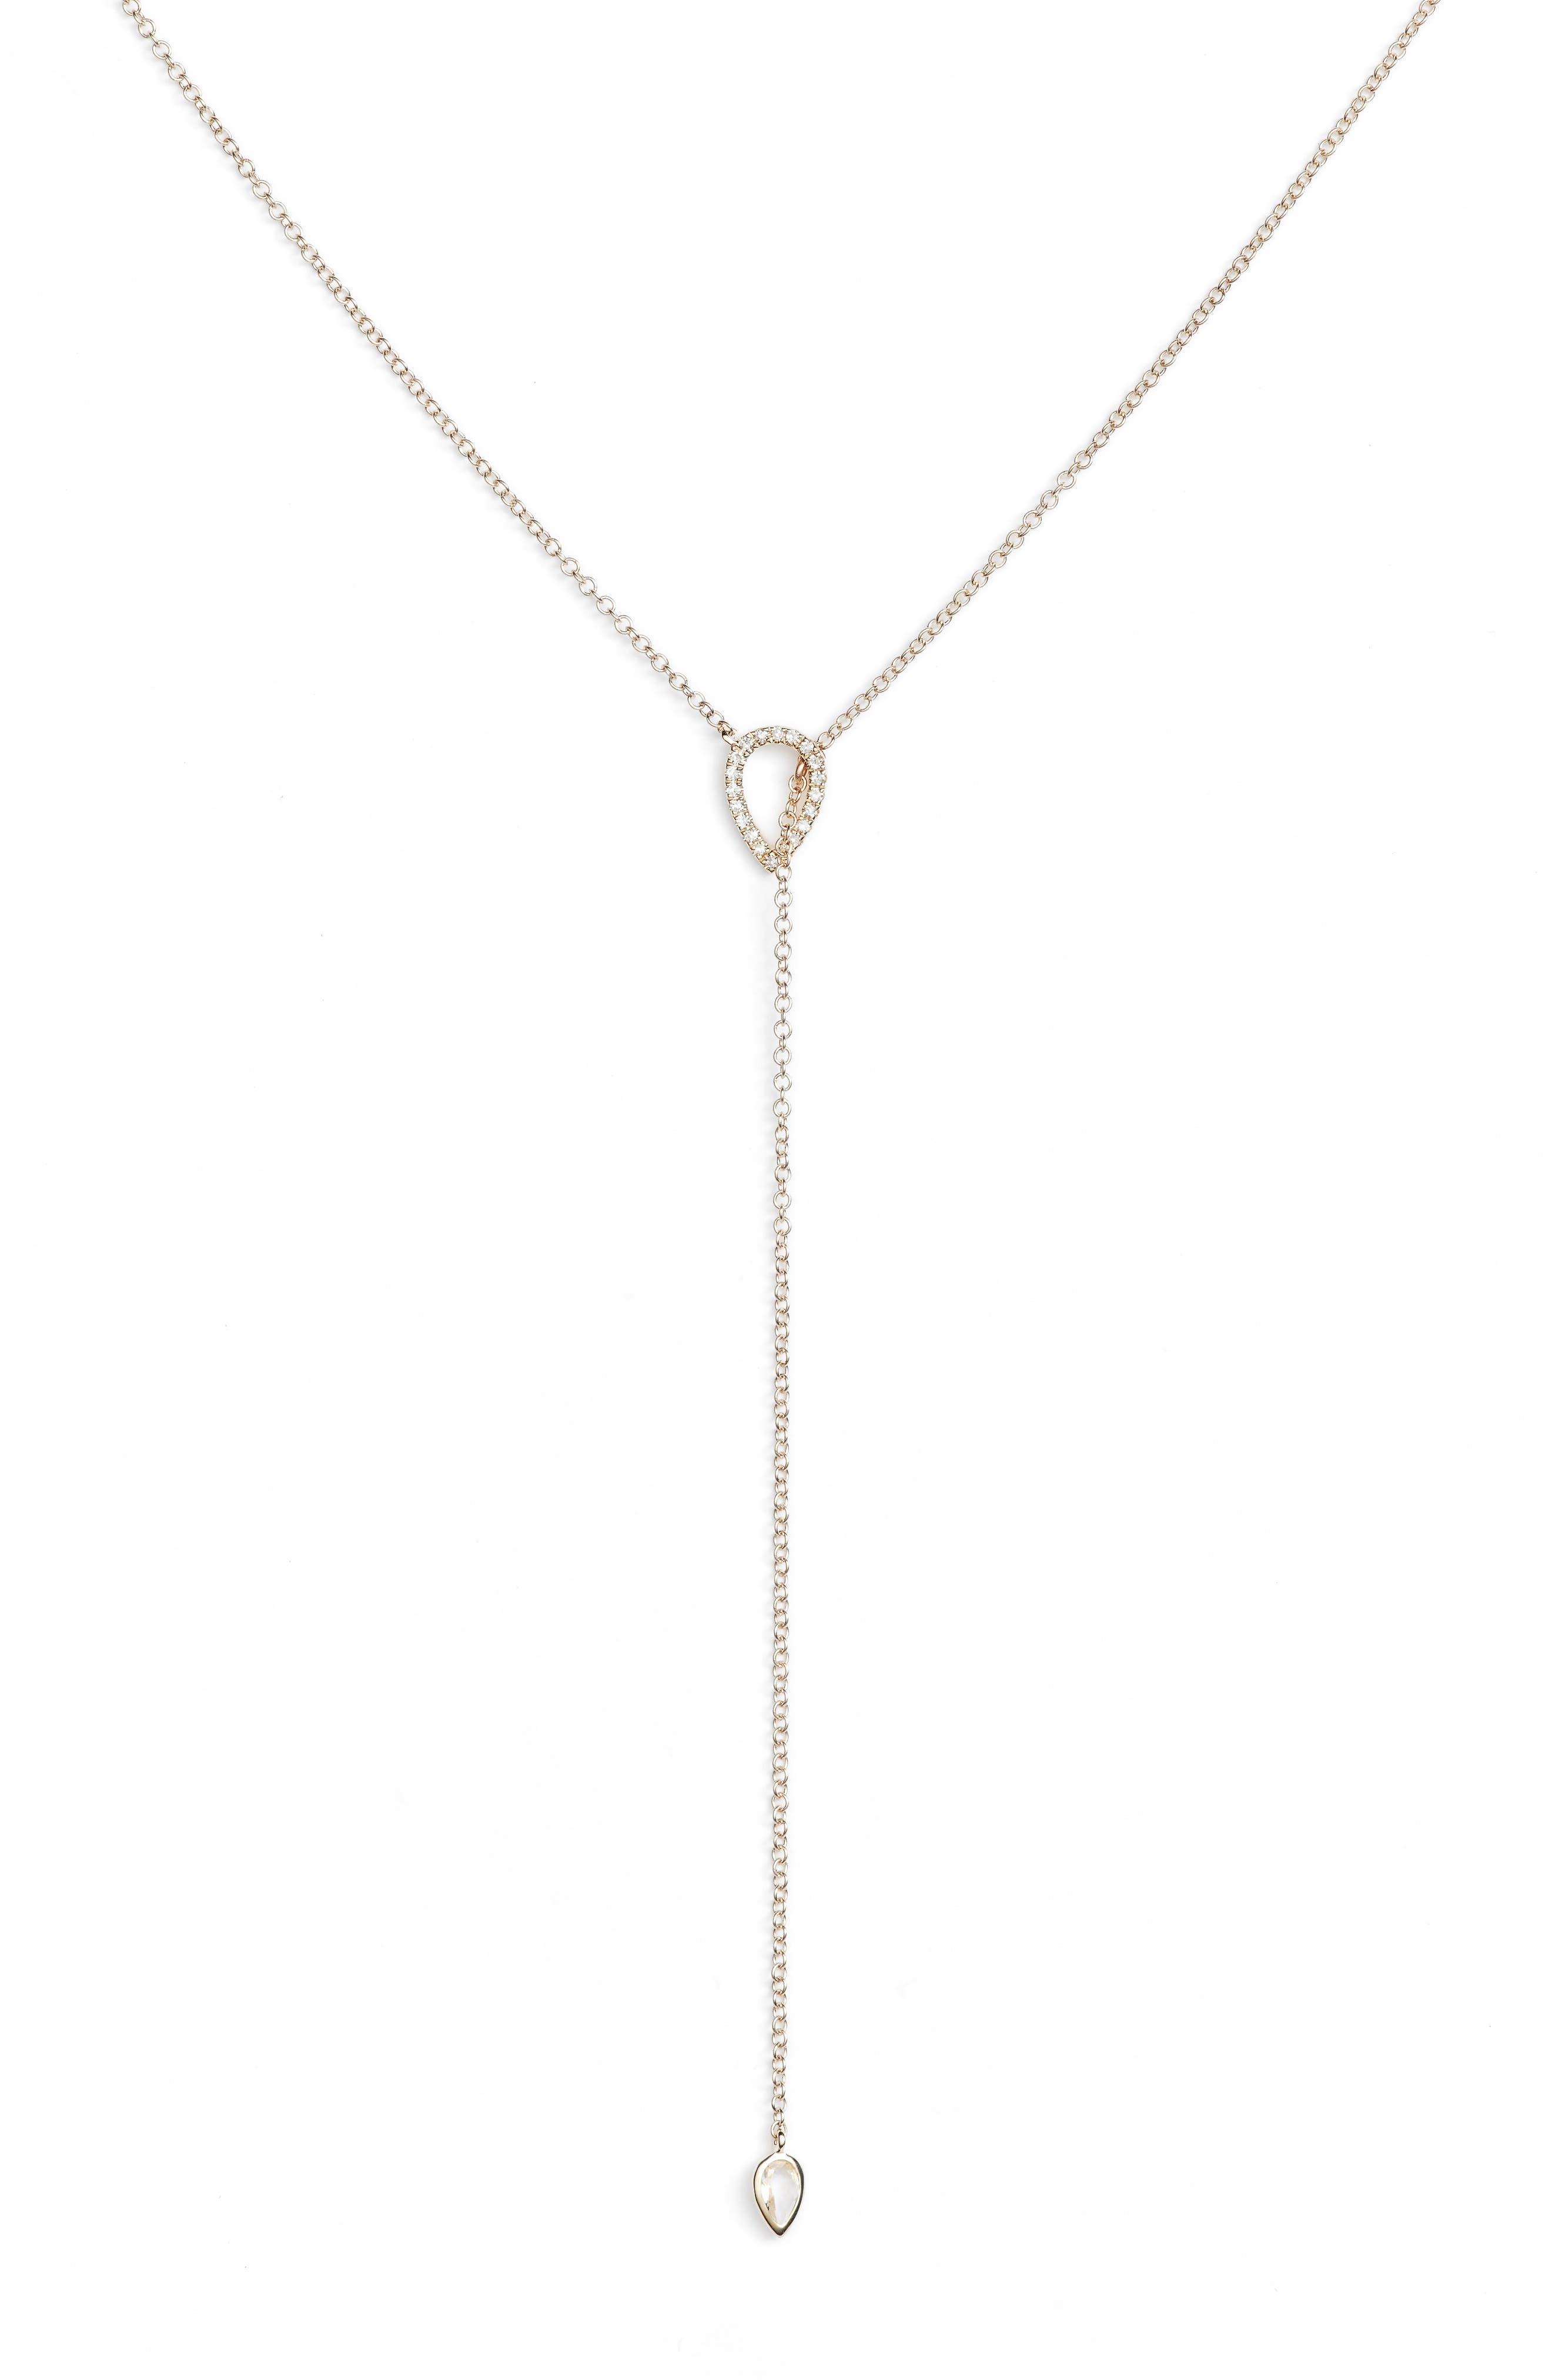 Teardrop Diamond Lariat Necklace,                             Main thumbnail 1, color,                             YELLOW GOLD